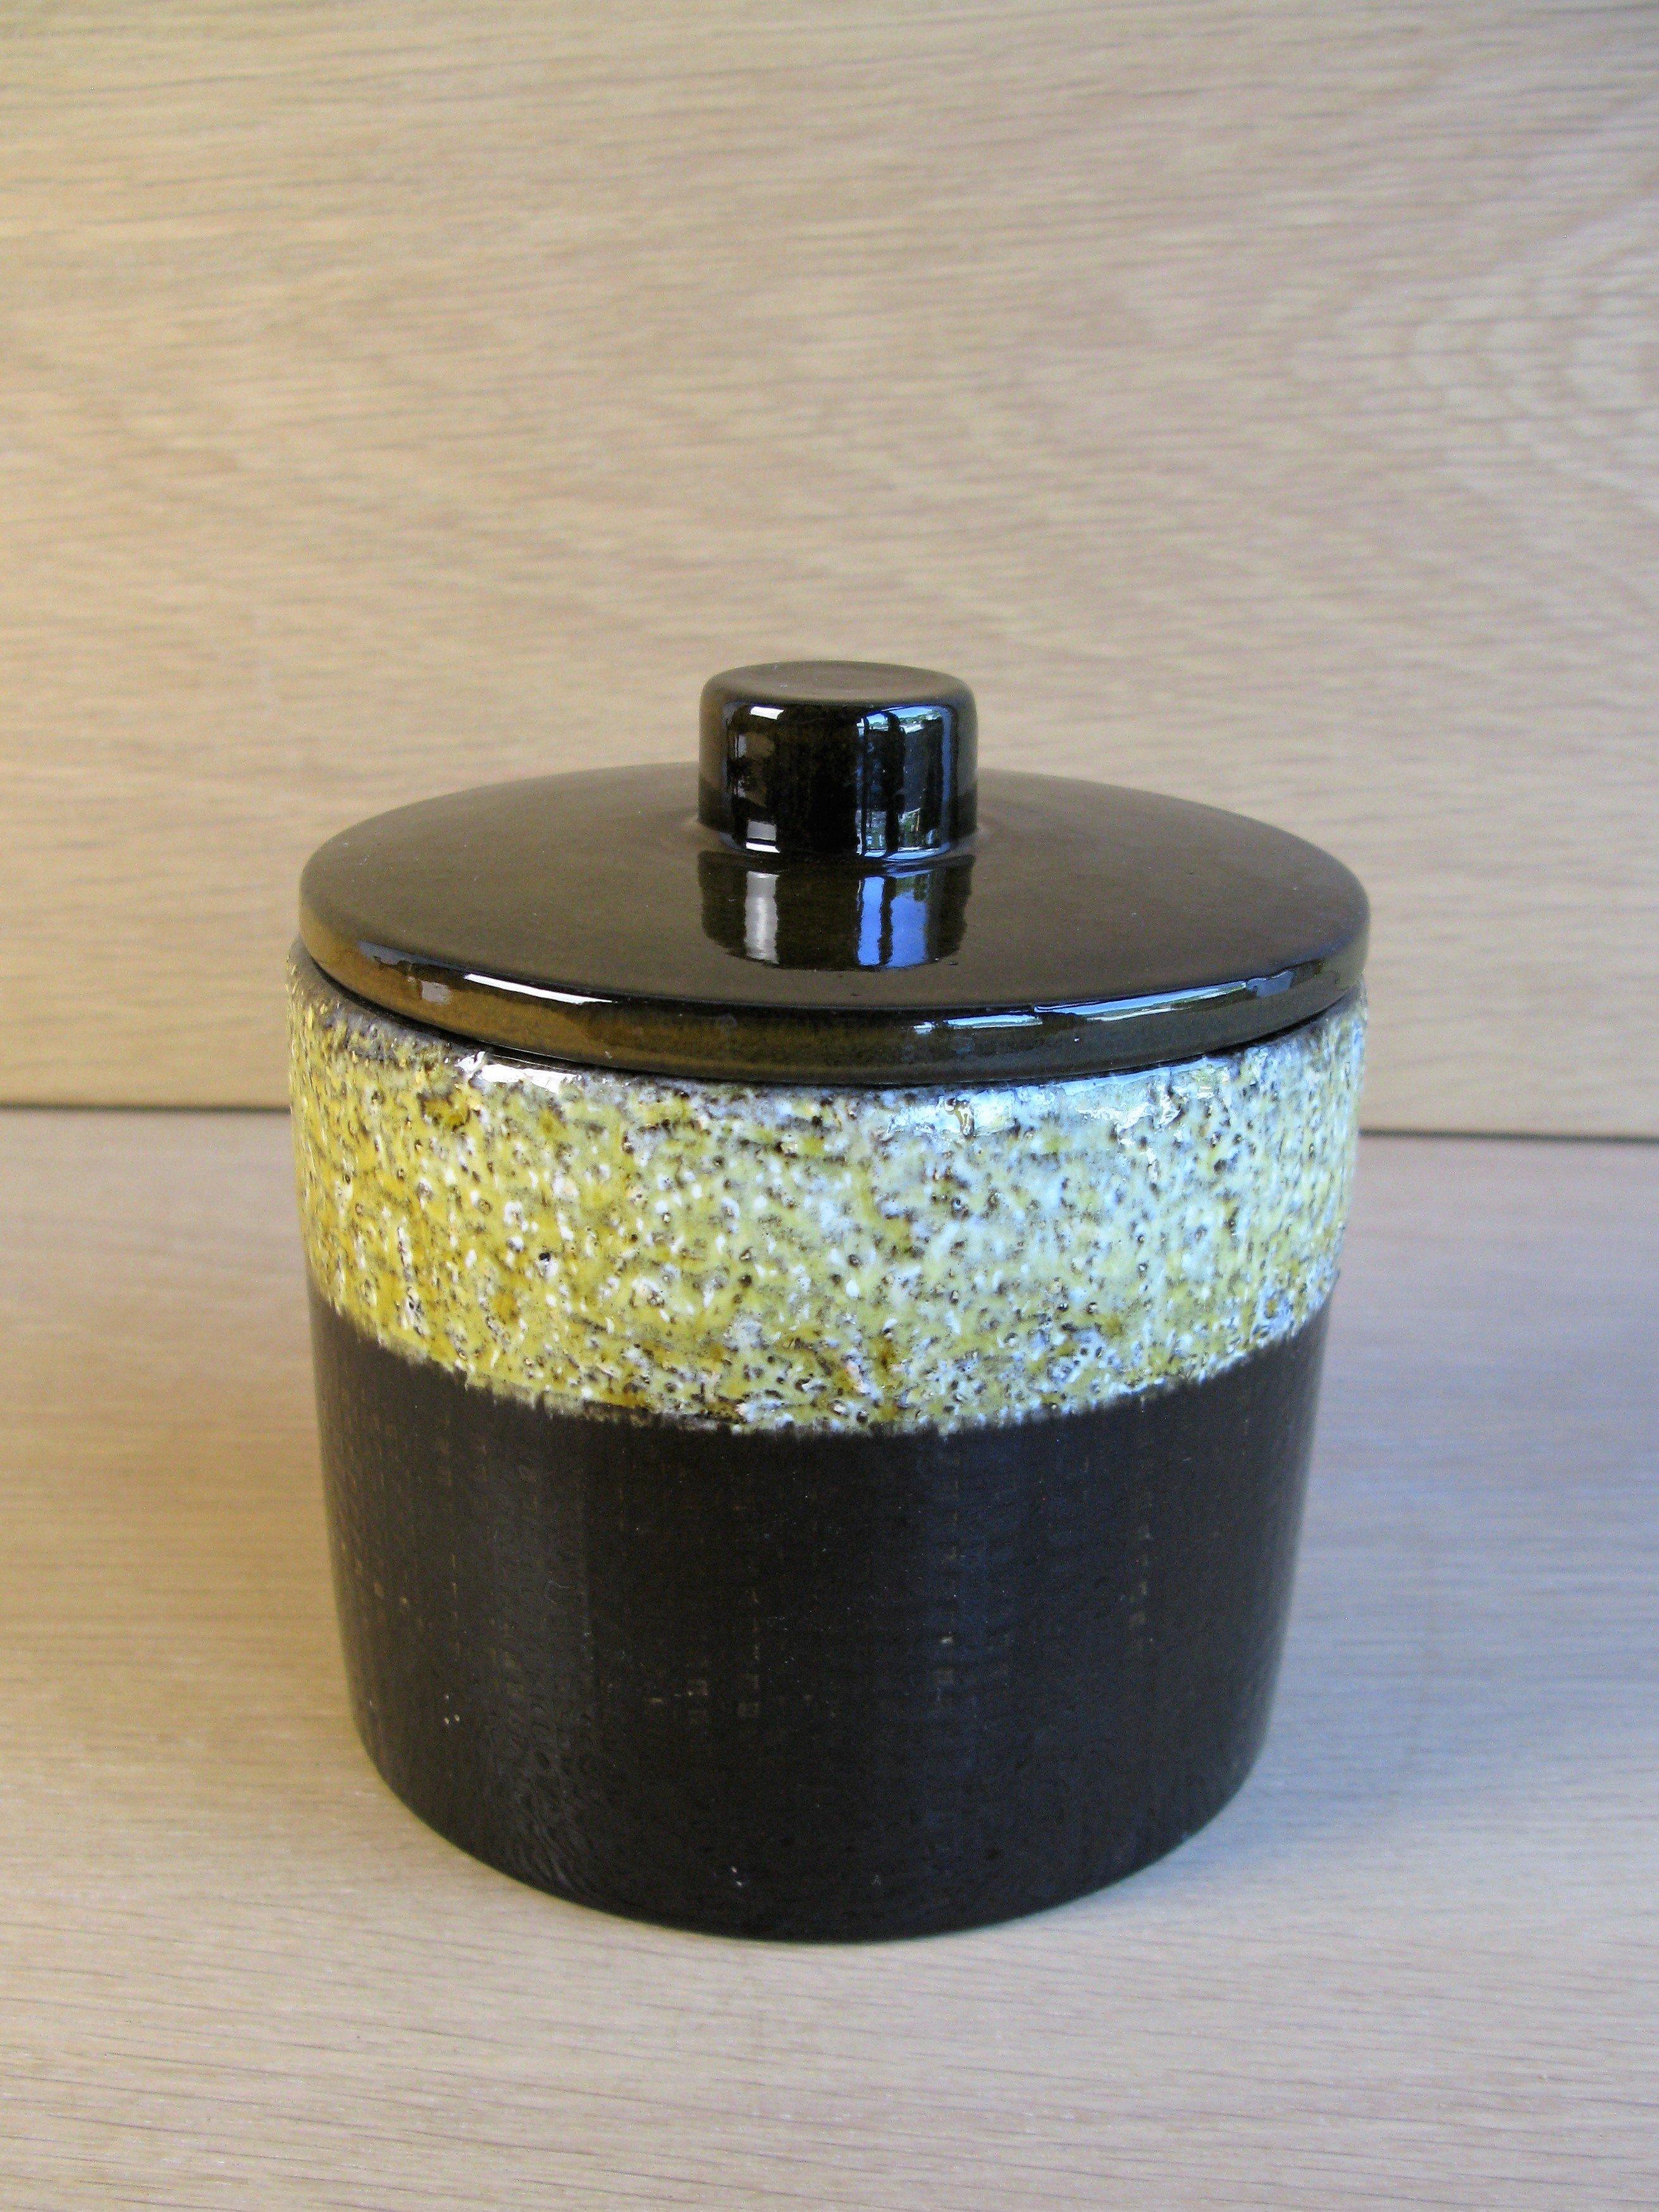 yondel tobacco jar 2493